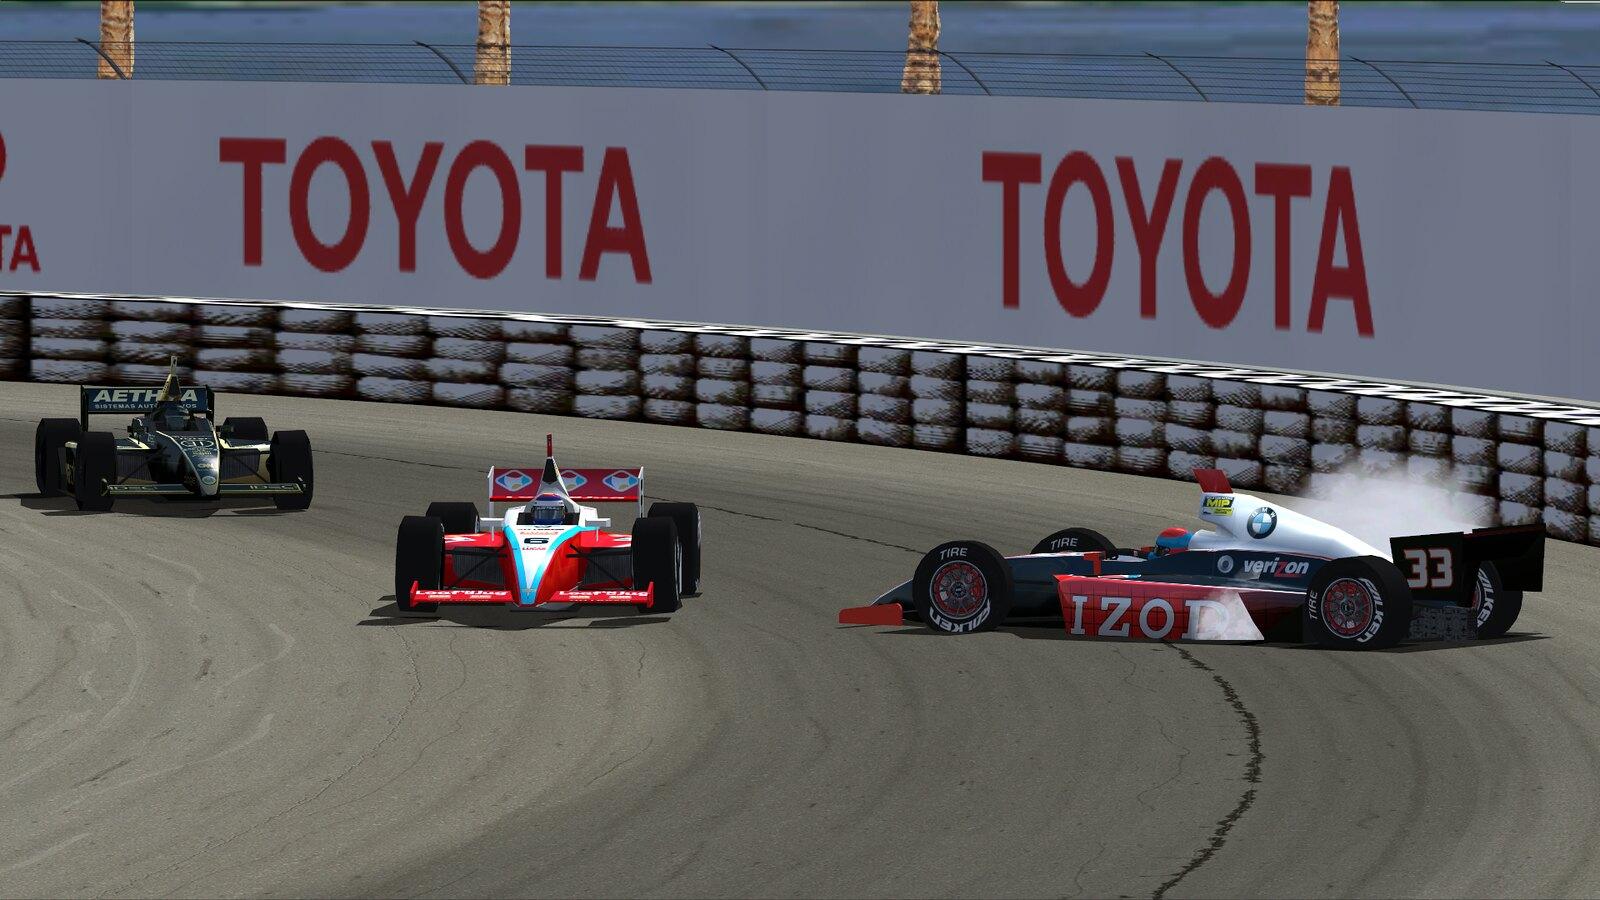 Lotus Grand Prix of Long Beach [33L] 7413261960_4150d1dba7_h